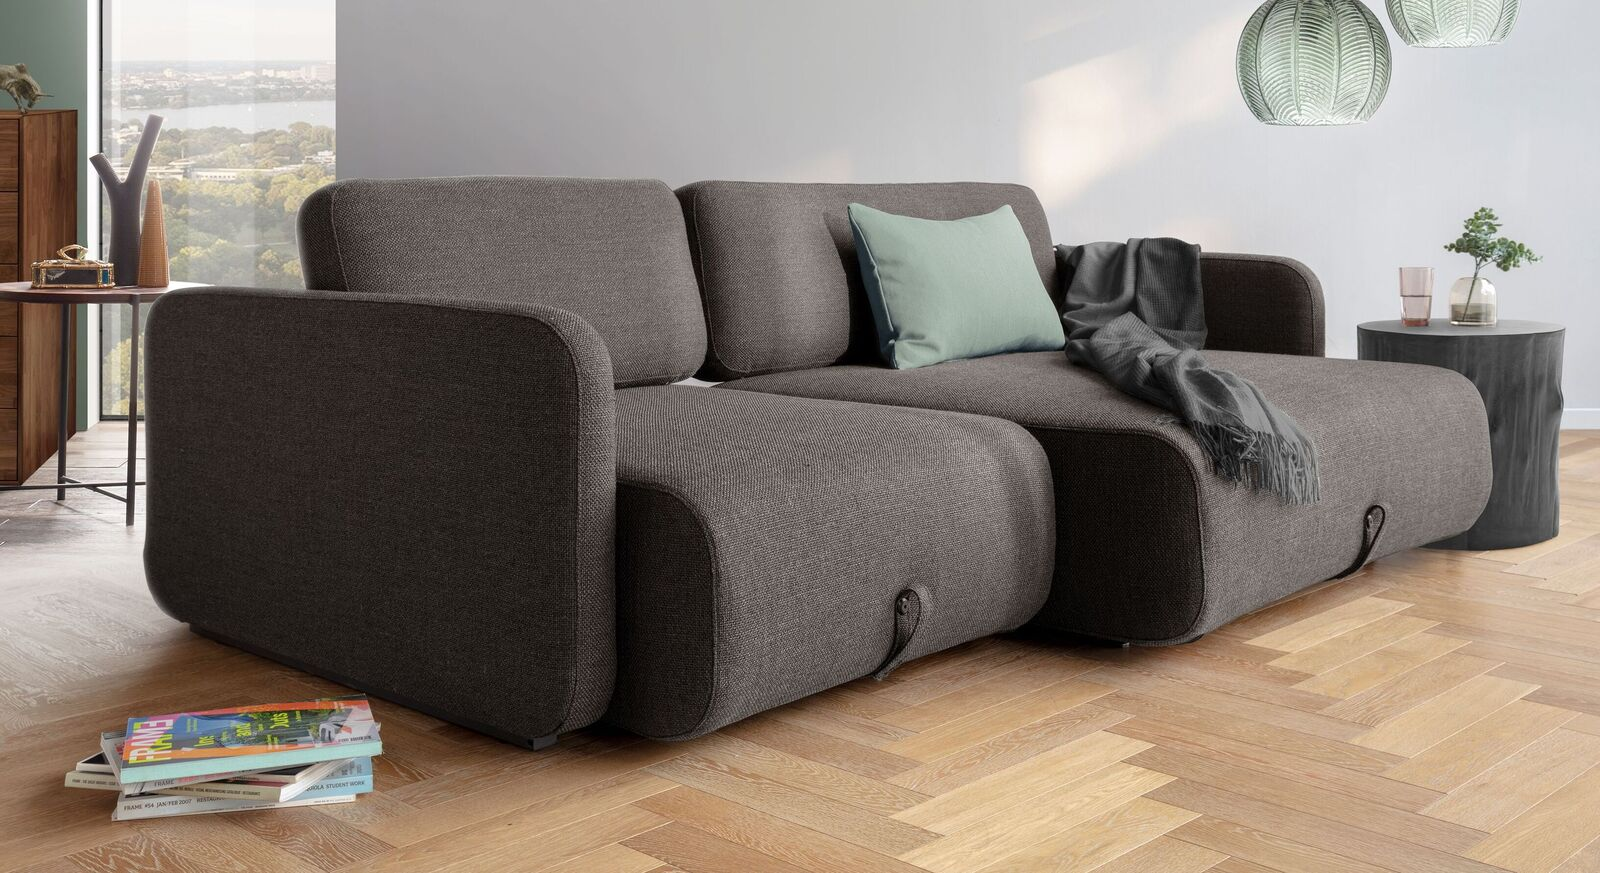 Exklusives Design-Schlafsofa Mikan